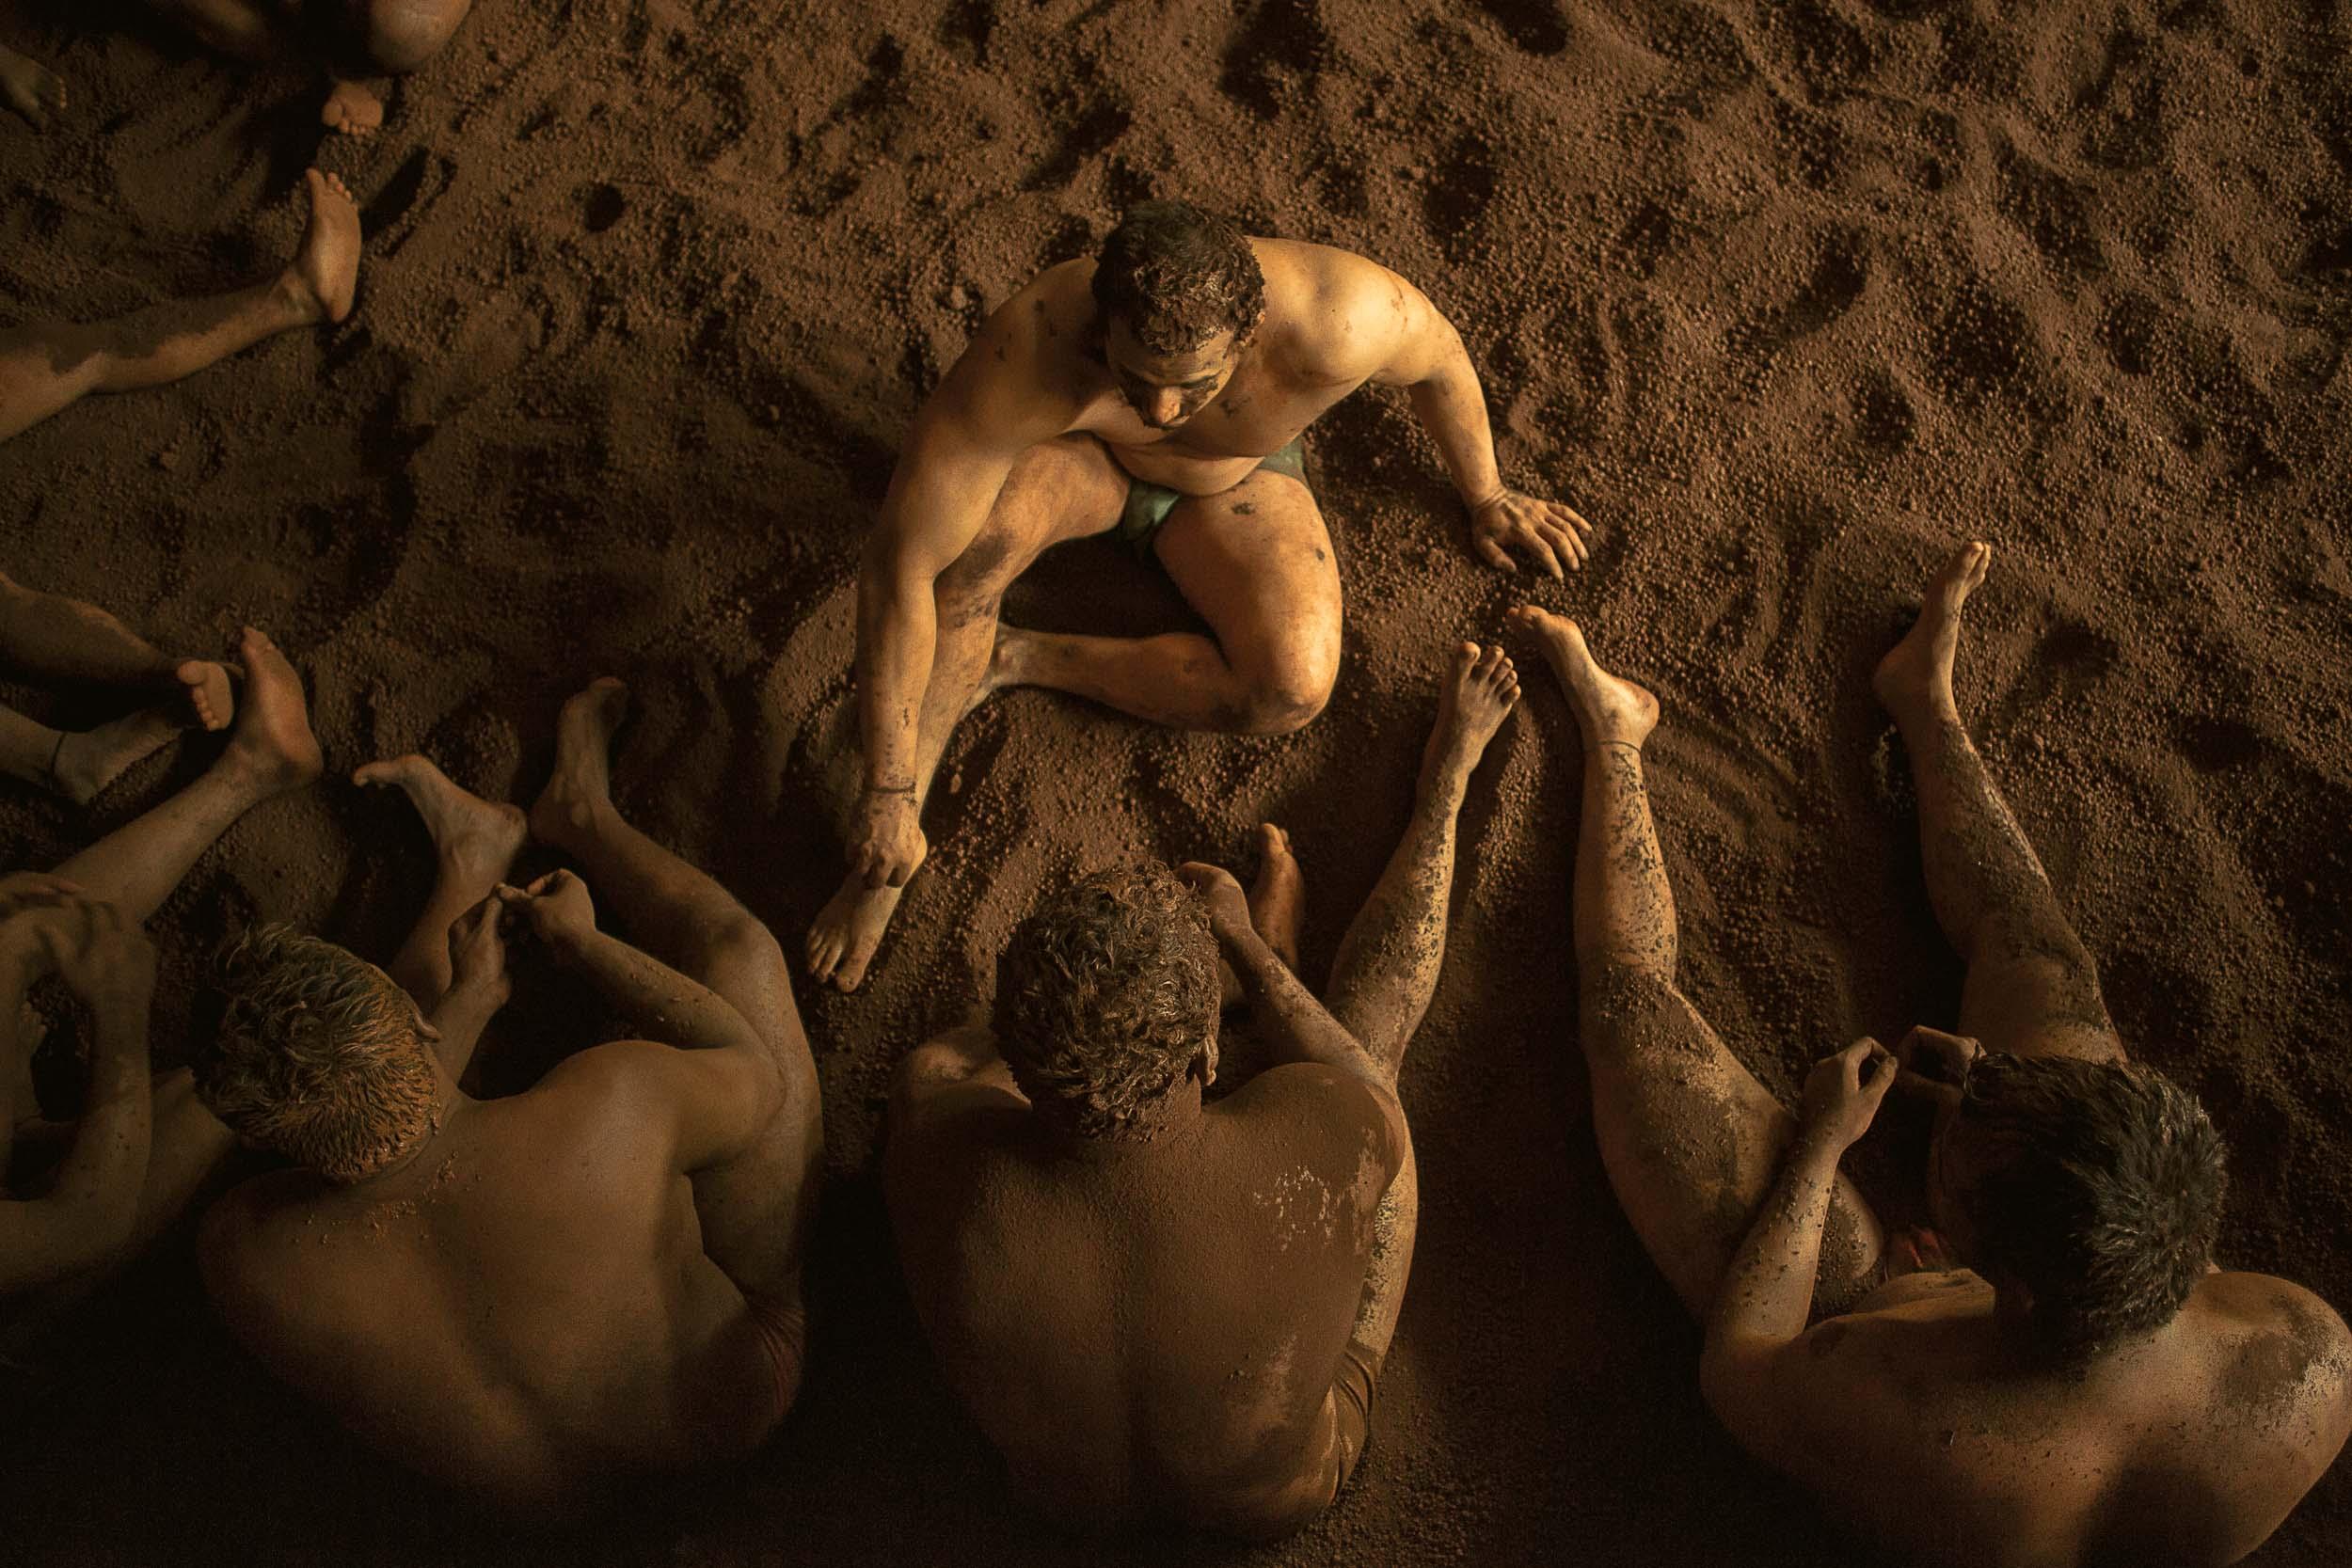 Sindhur_Photography_Travel_People_Wrestlers-31.JPG